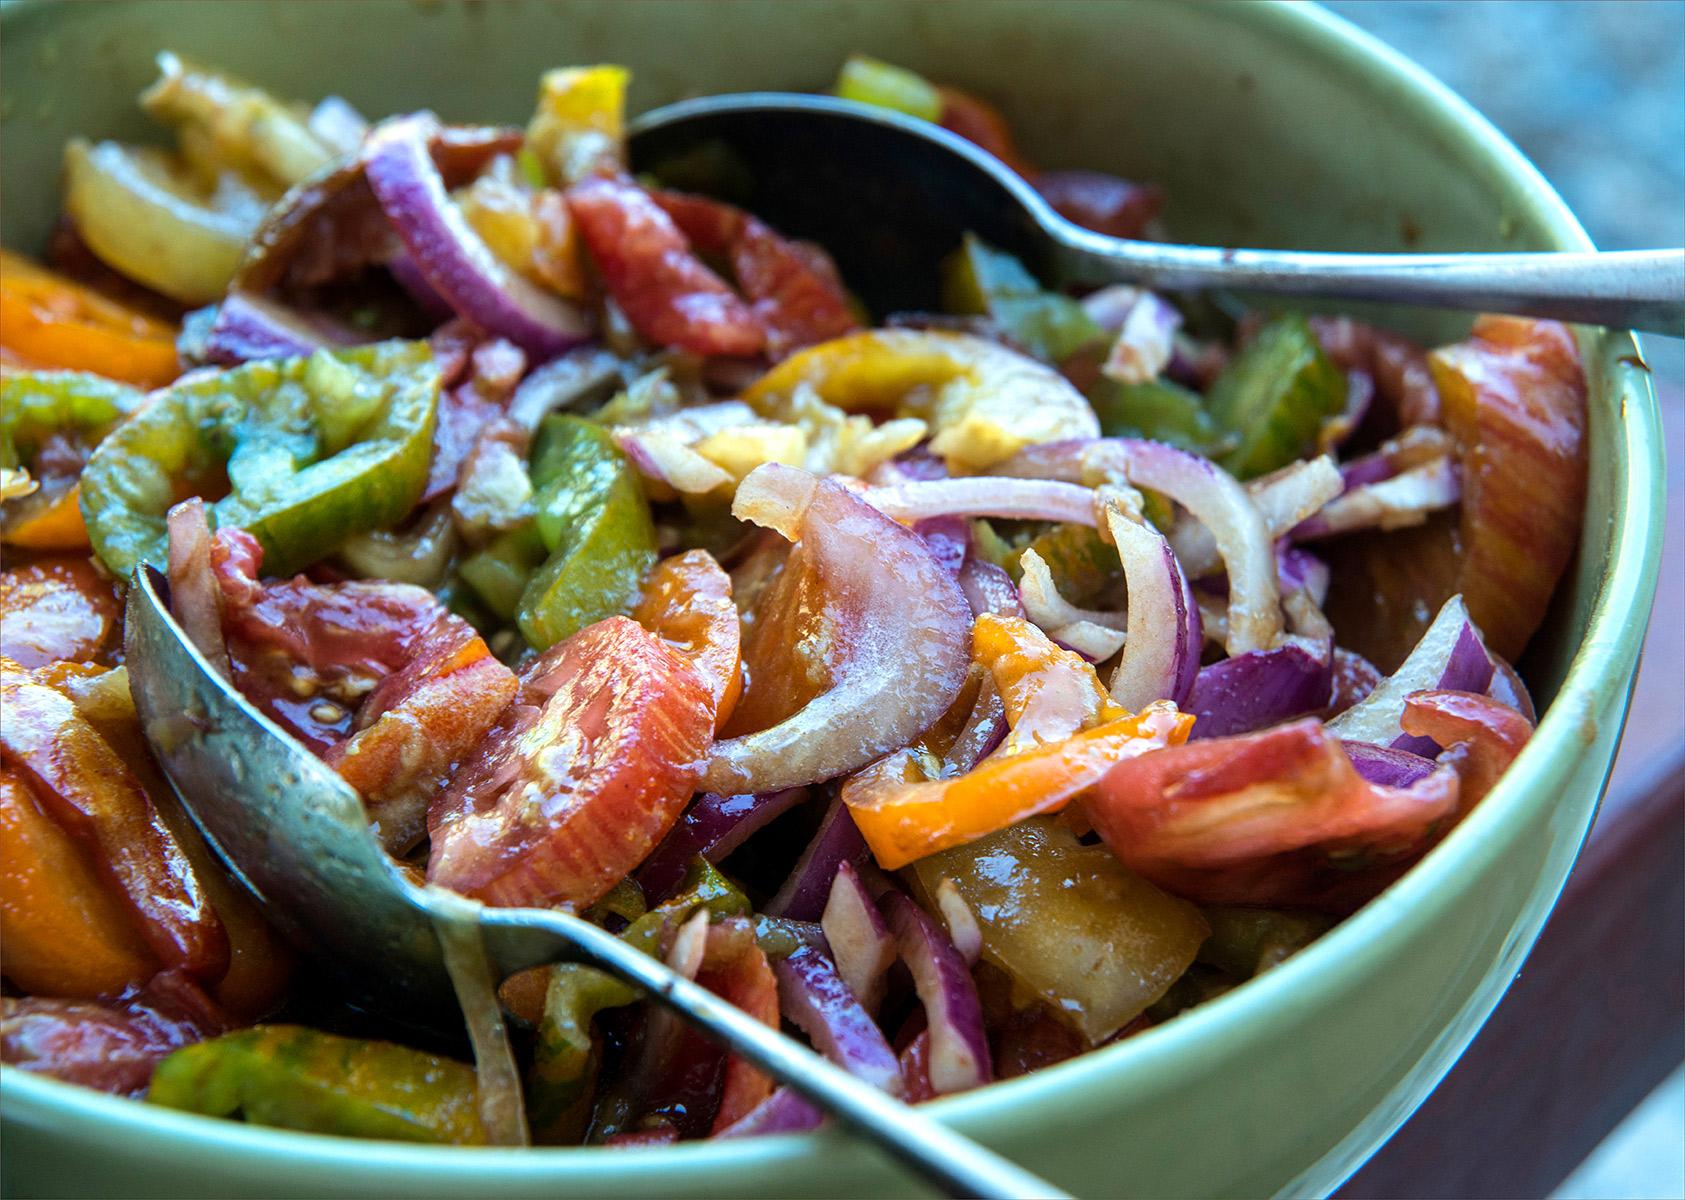 tomatoe-and-onion-salad